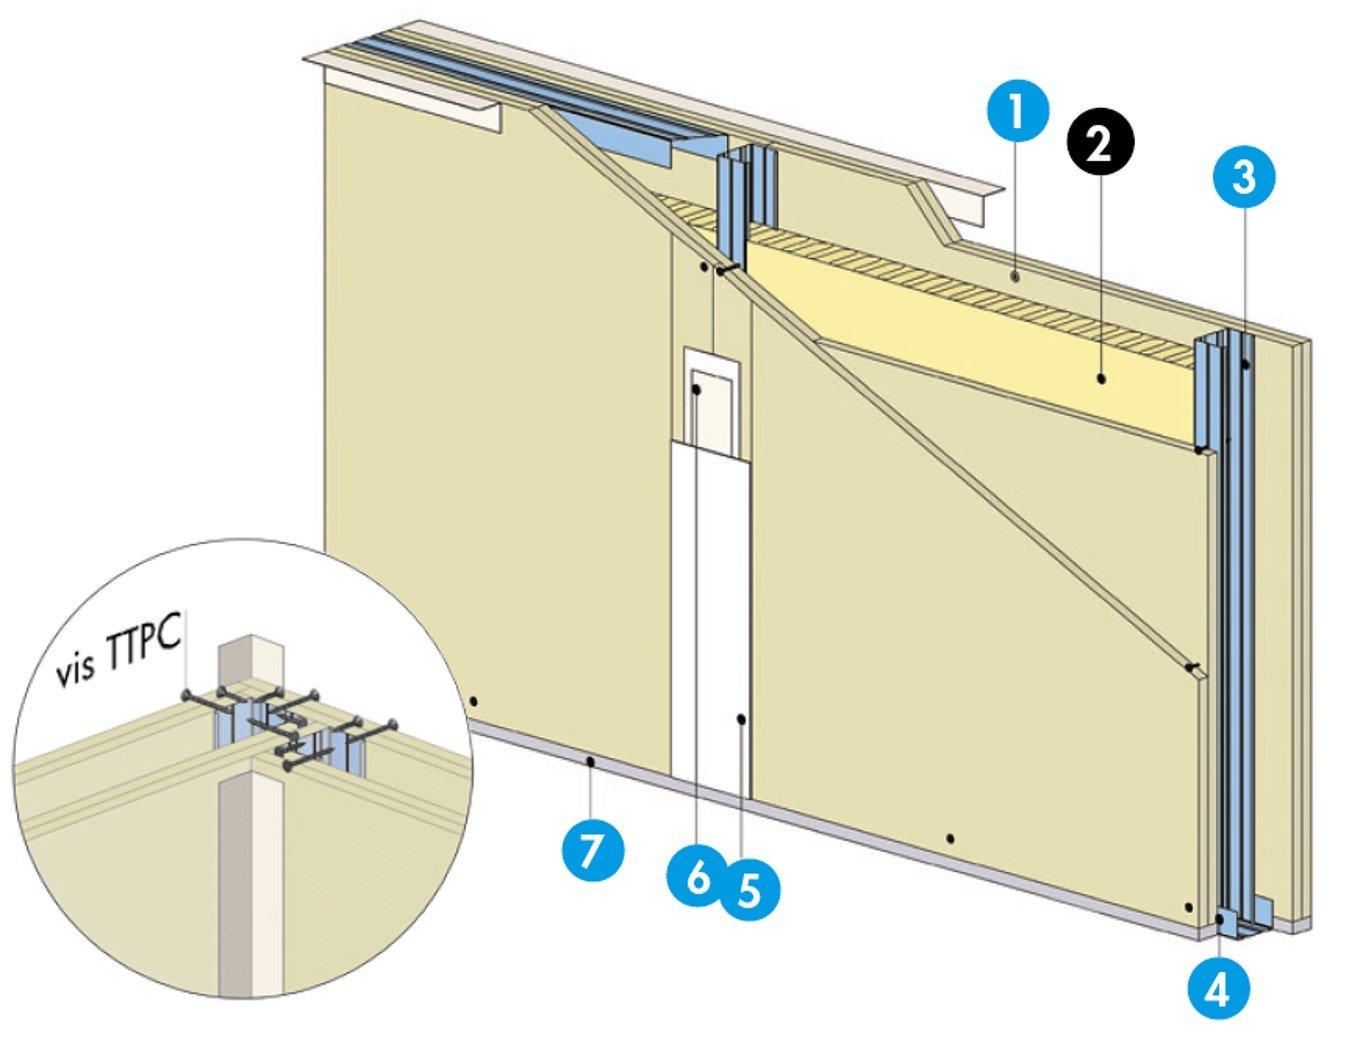 Cloison Km 98 48 4kf13 40db Ei120 3 0m Montant Simple Entraxe 600 Cloisons Km Isolantes Knauf